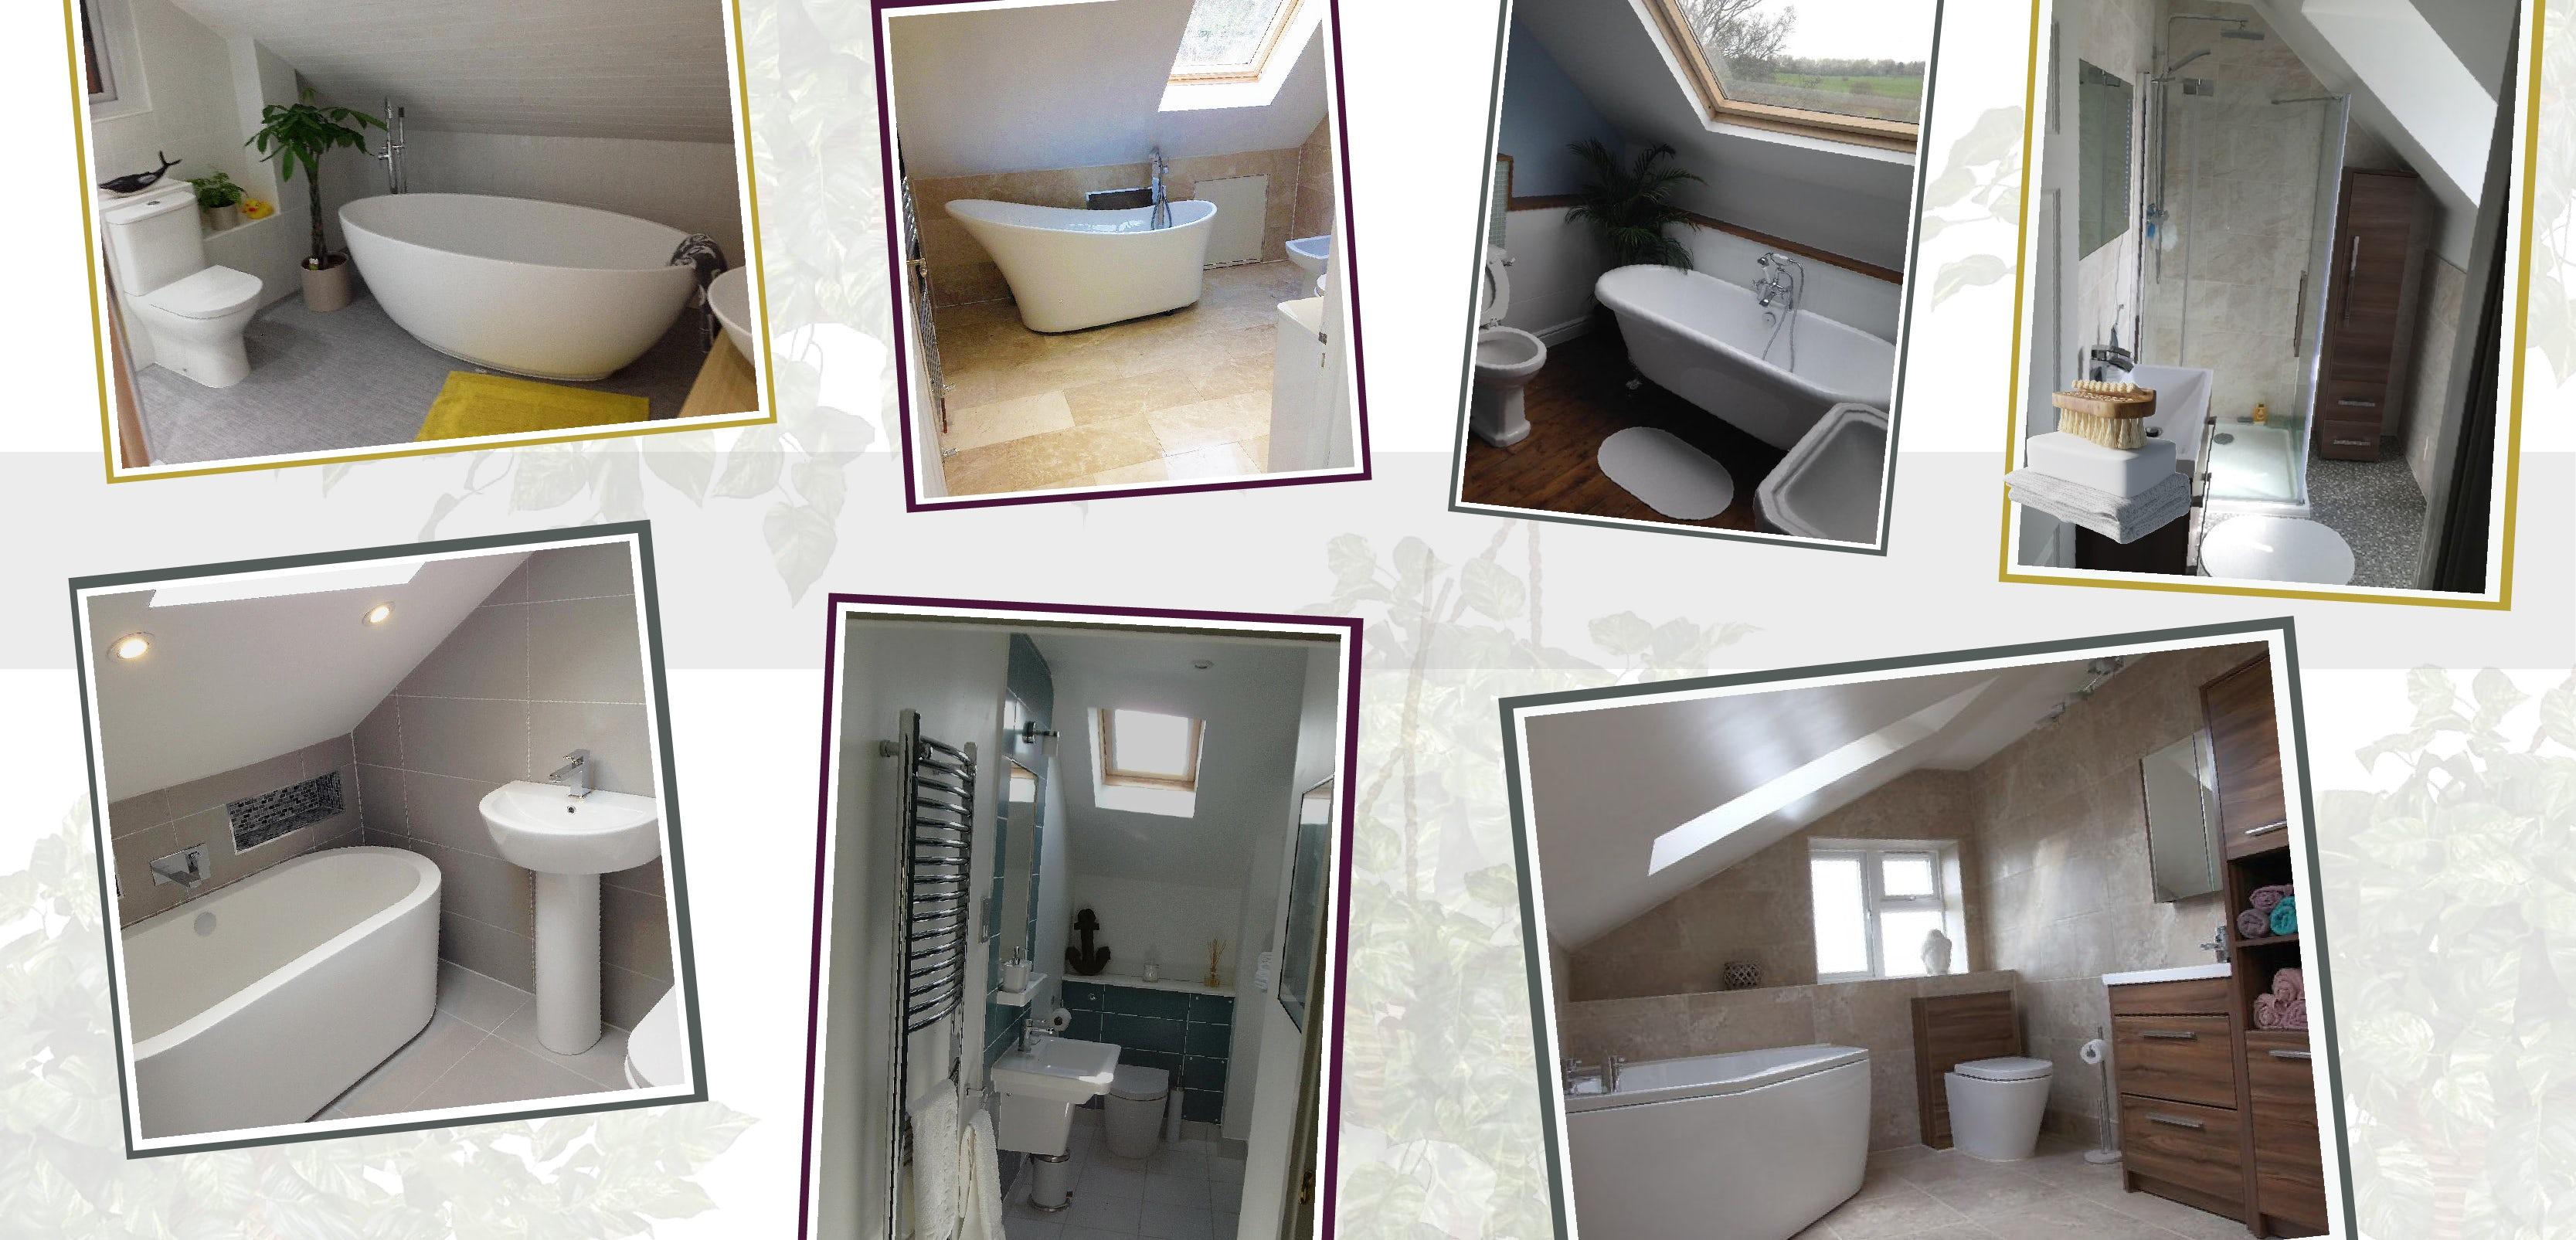 The best bathroom suites for loft conversions